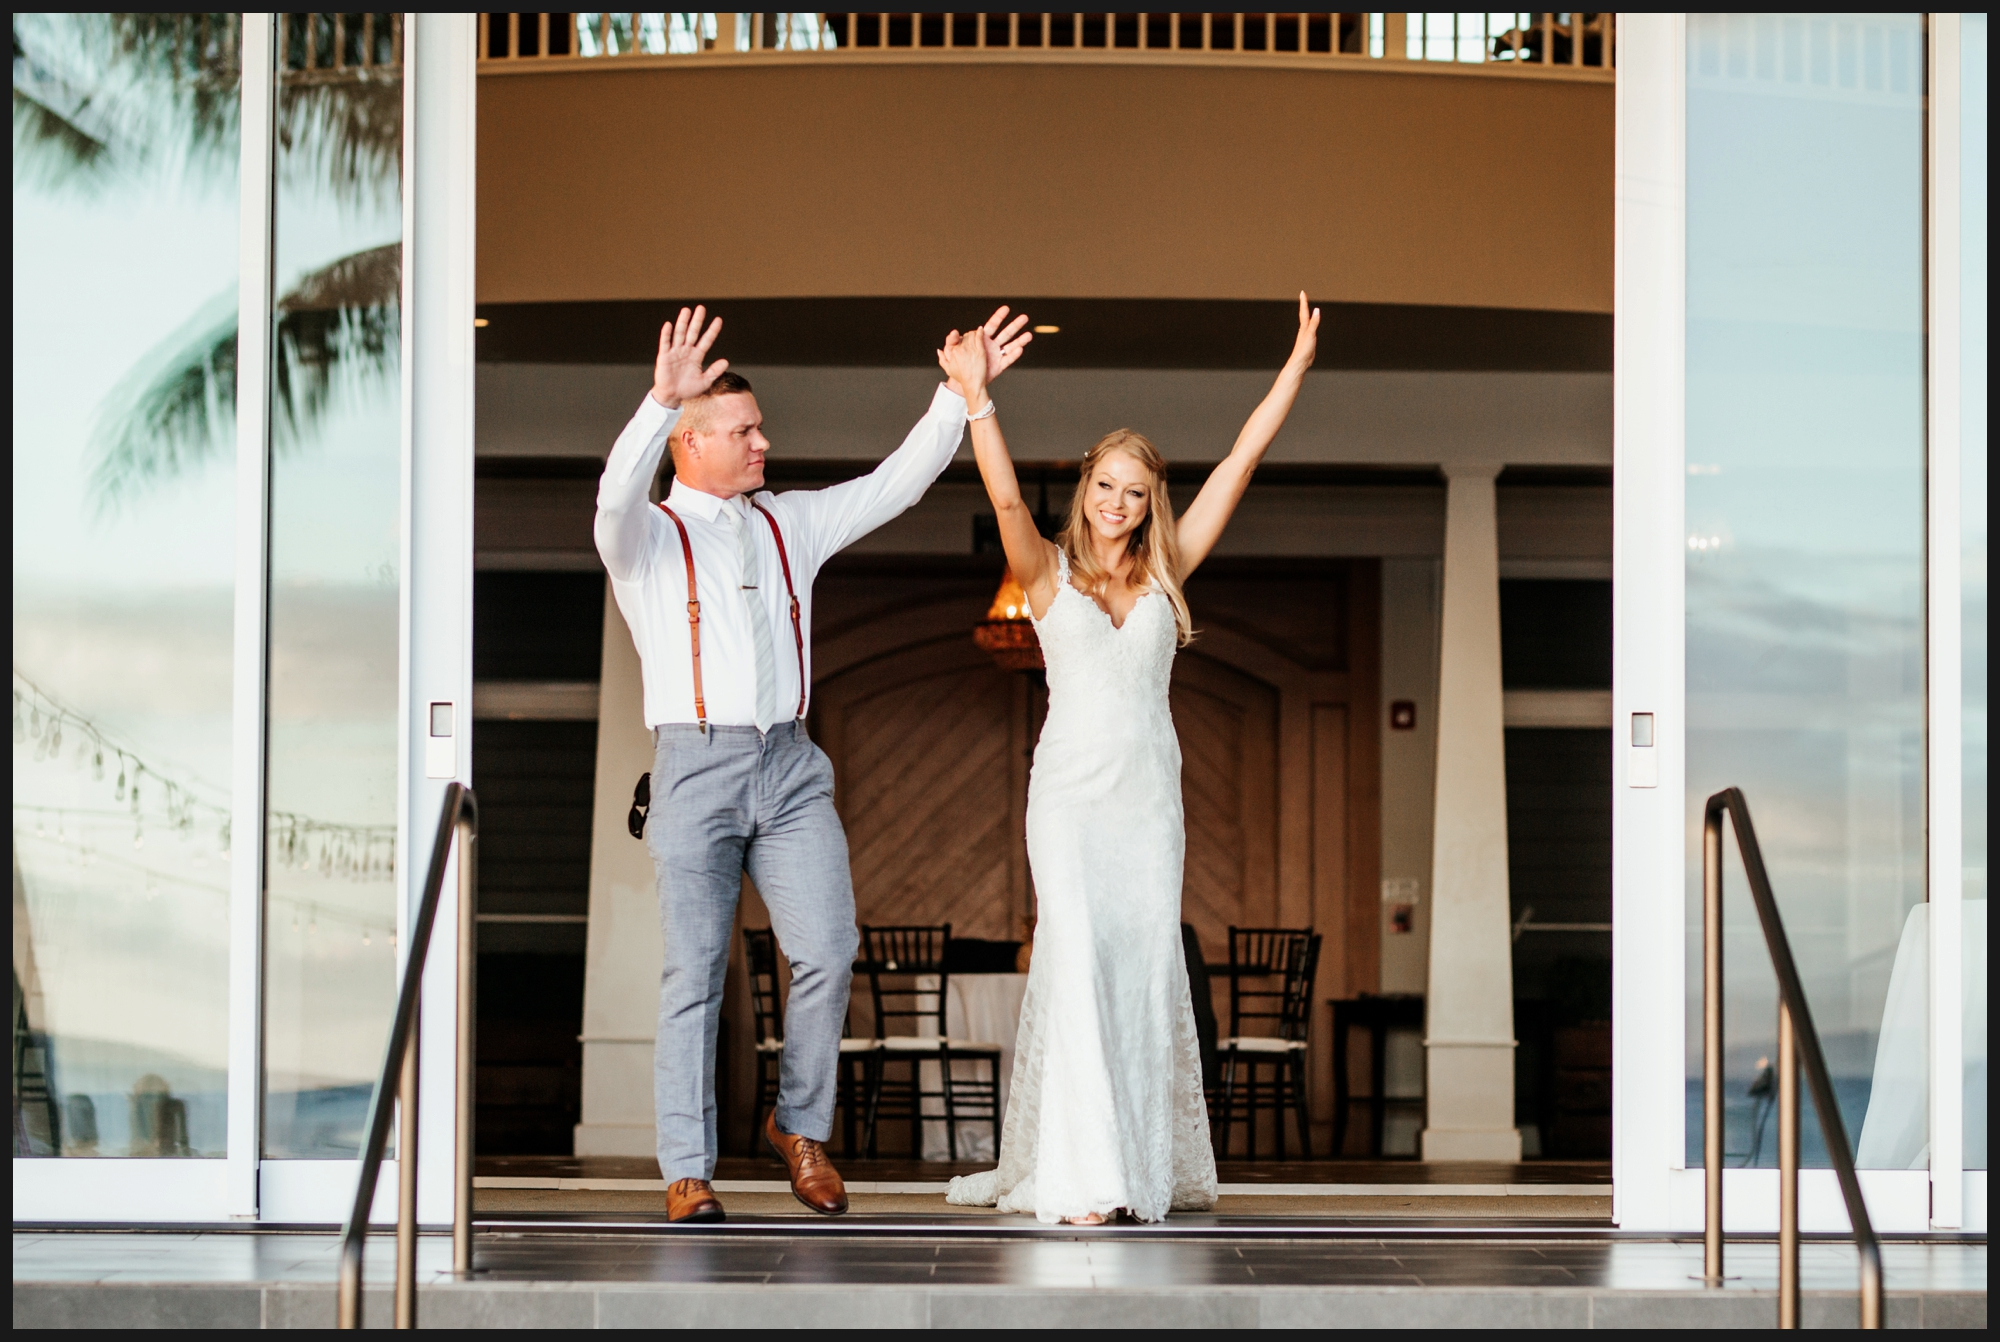 Orlando-Wedding-Photographer-destination-wedding-photographer-florida-wedding-photographer-hawaii-wedding-photographer_0089.jpg